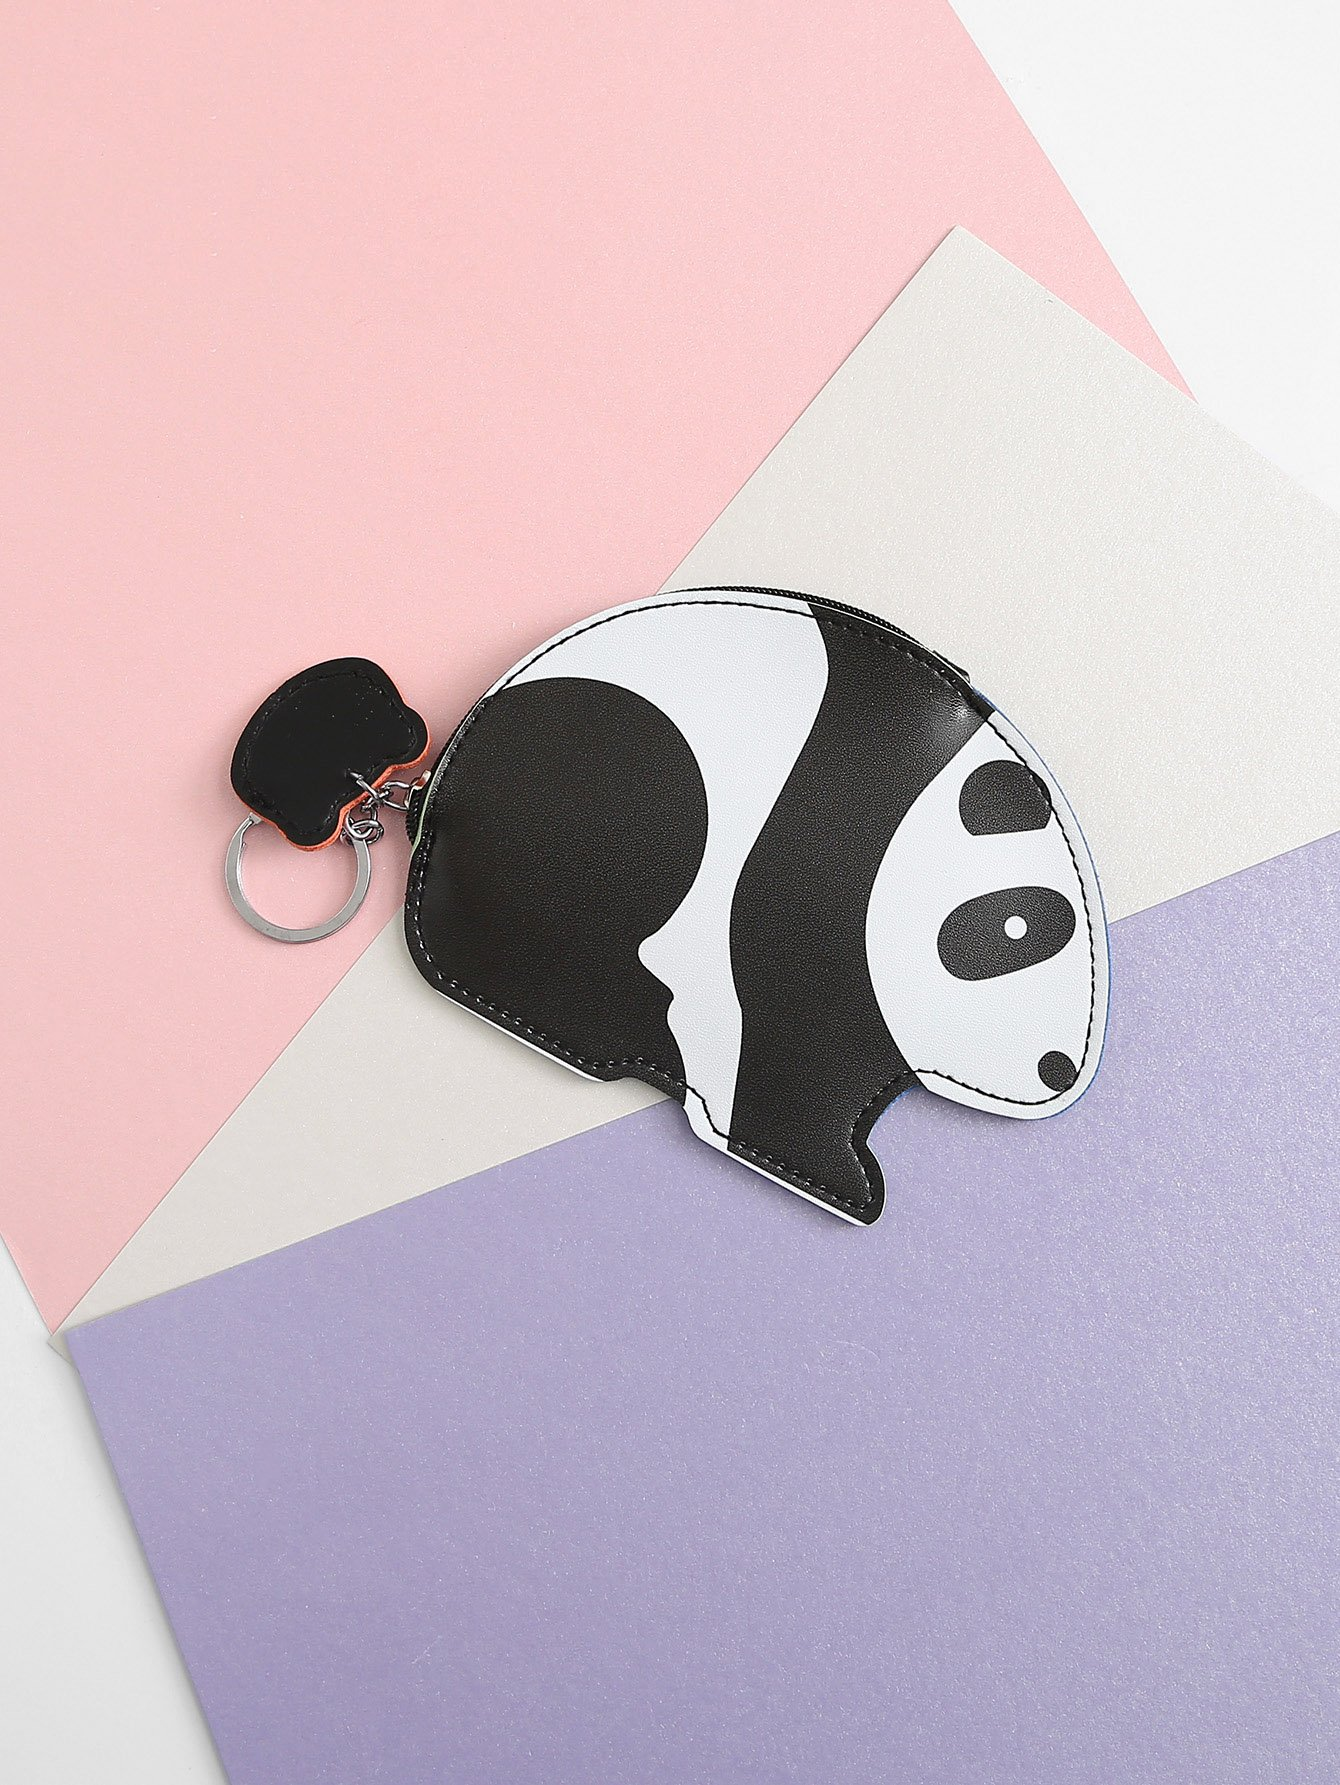 Panda Shaped Coin Purse 2017 cute girls coin purses small coin bag key ring kawaii bag kids mini wallet card holders leather cartoon coin purse1bw73